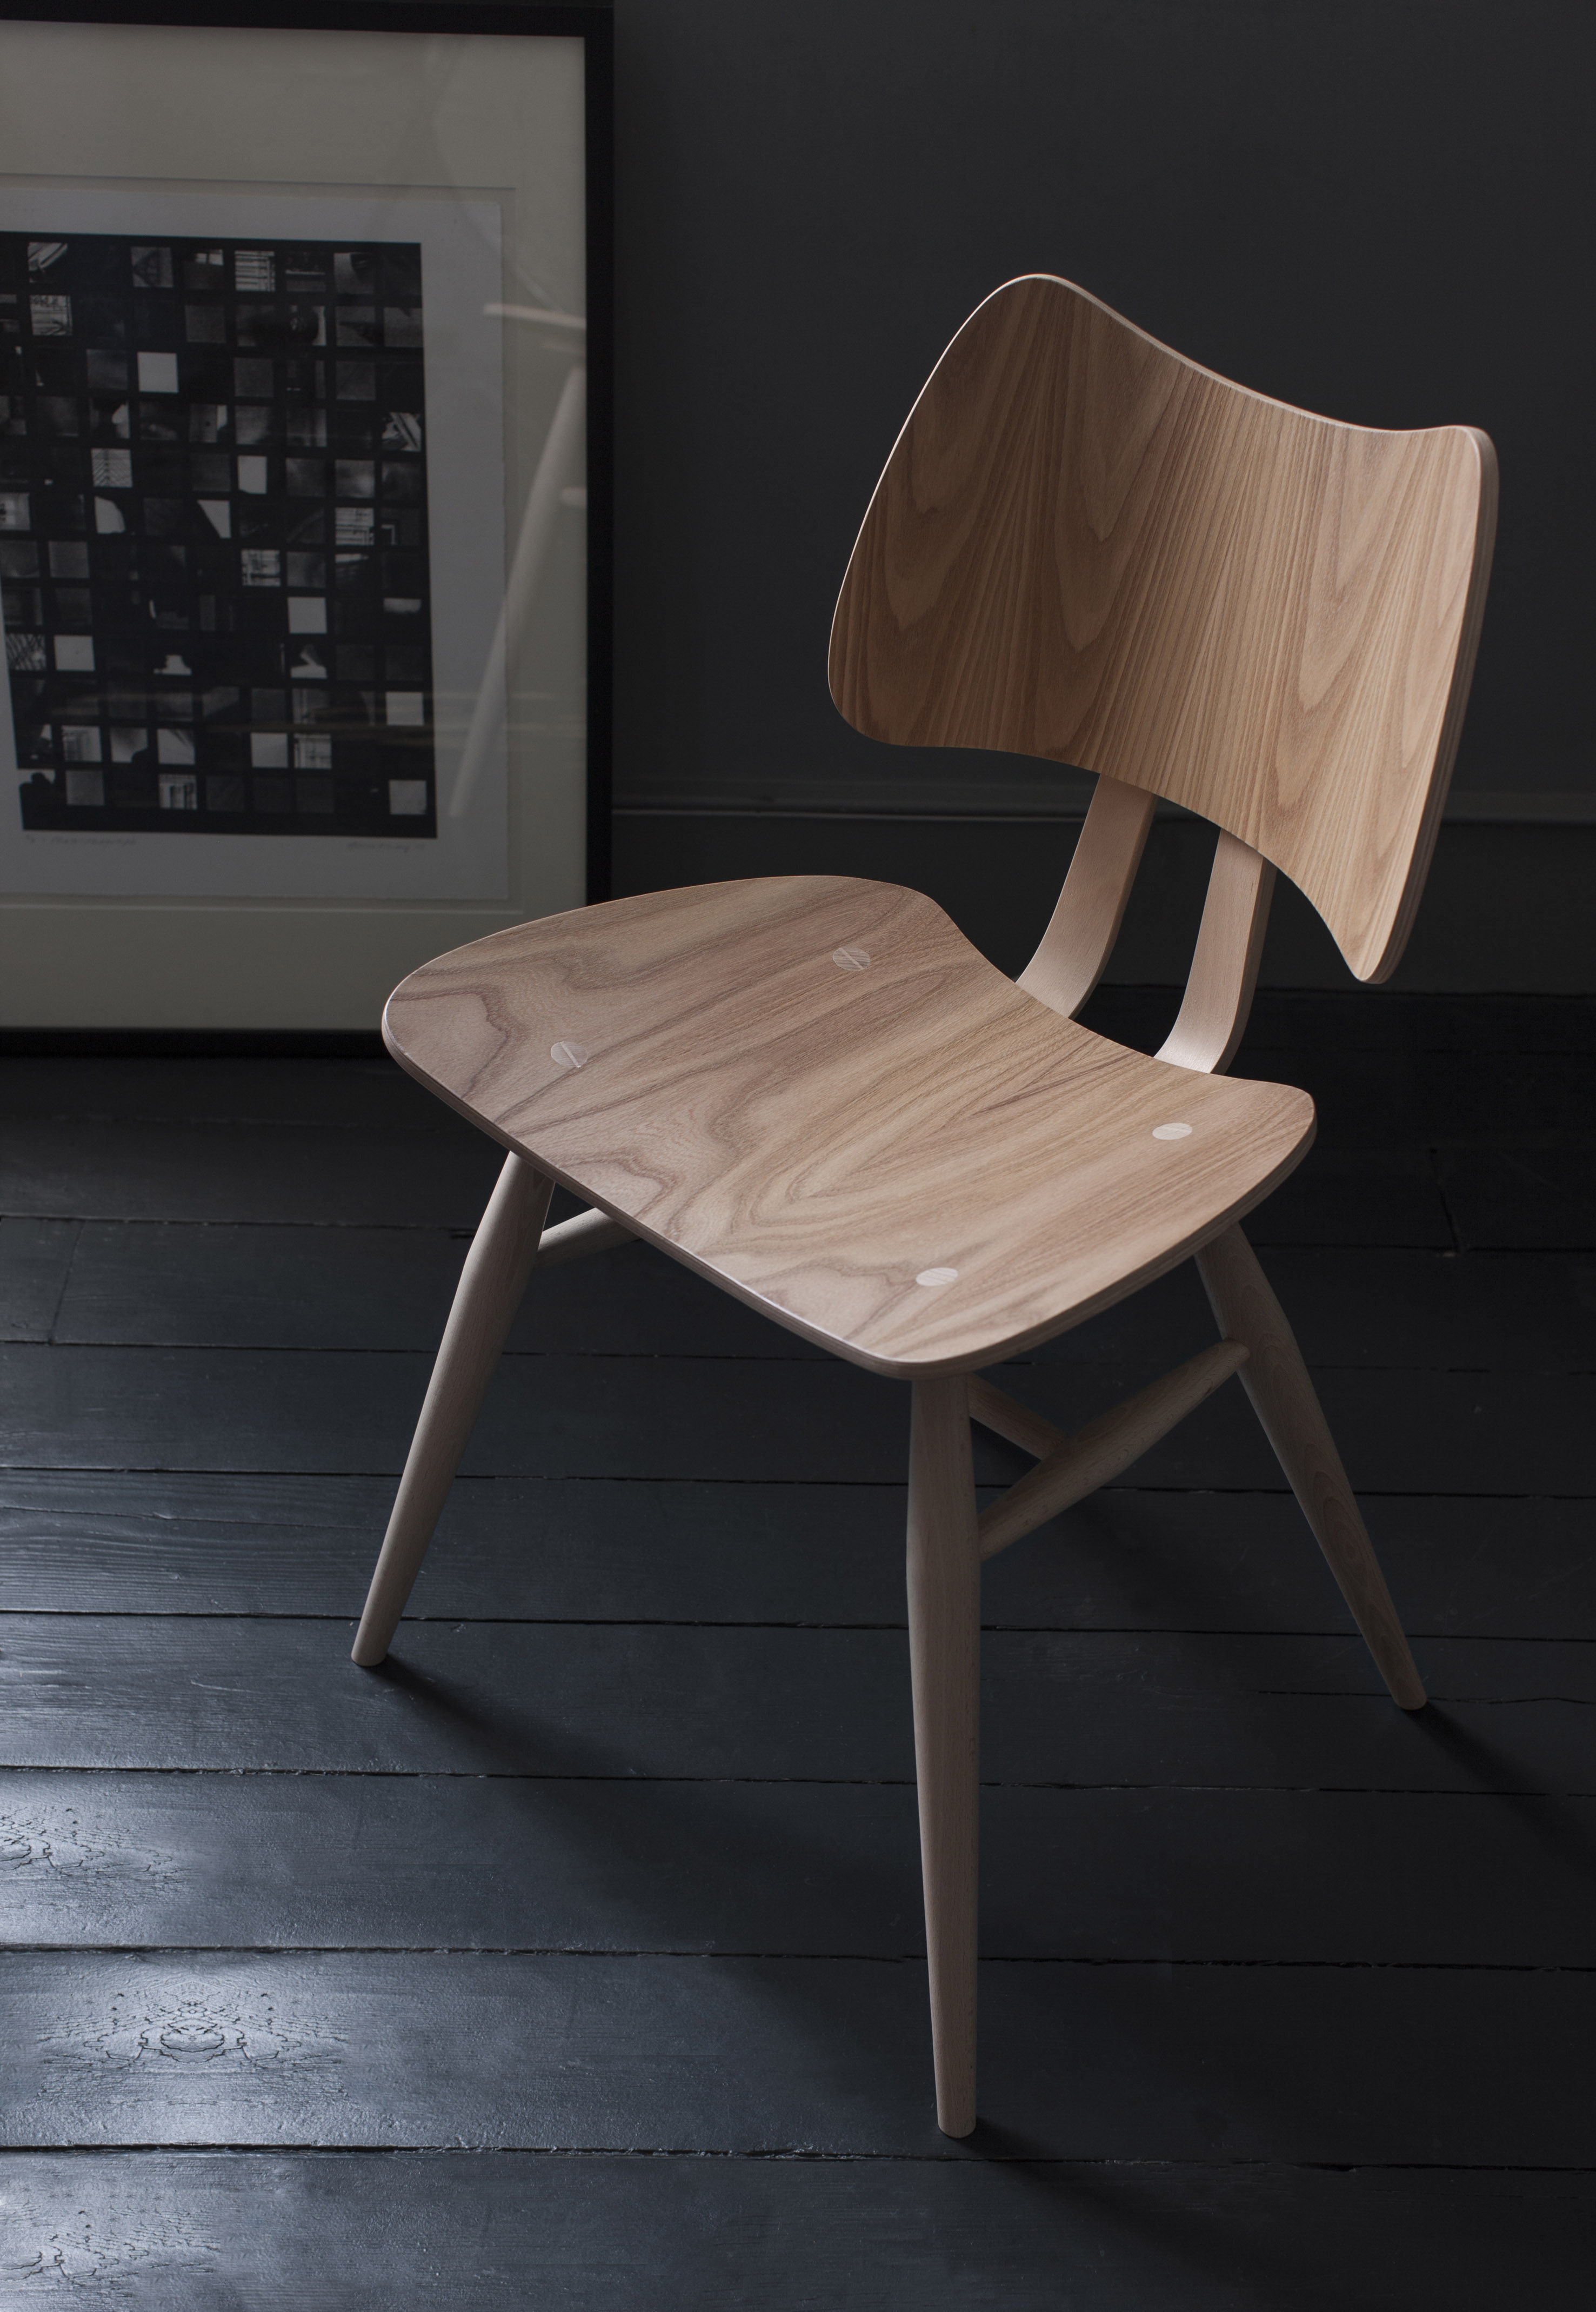 chaise butterfly bois r dition 1958 bois naturel ercol. Black Bedroom Furniture Sets. Home Design Ideas